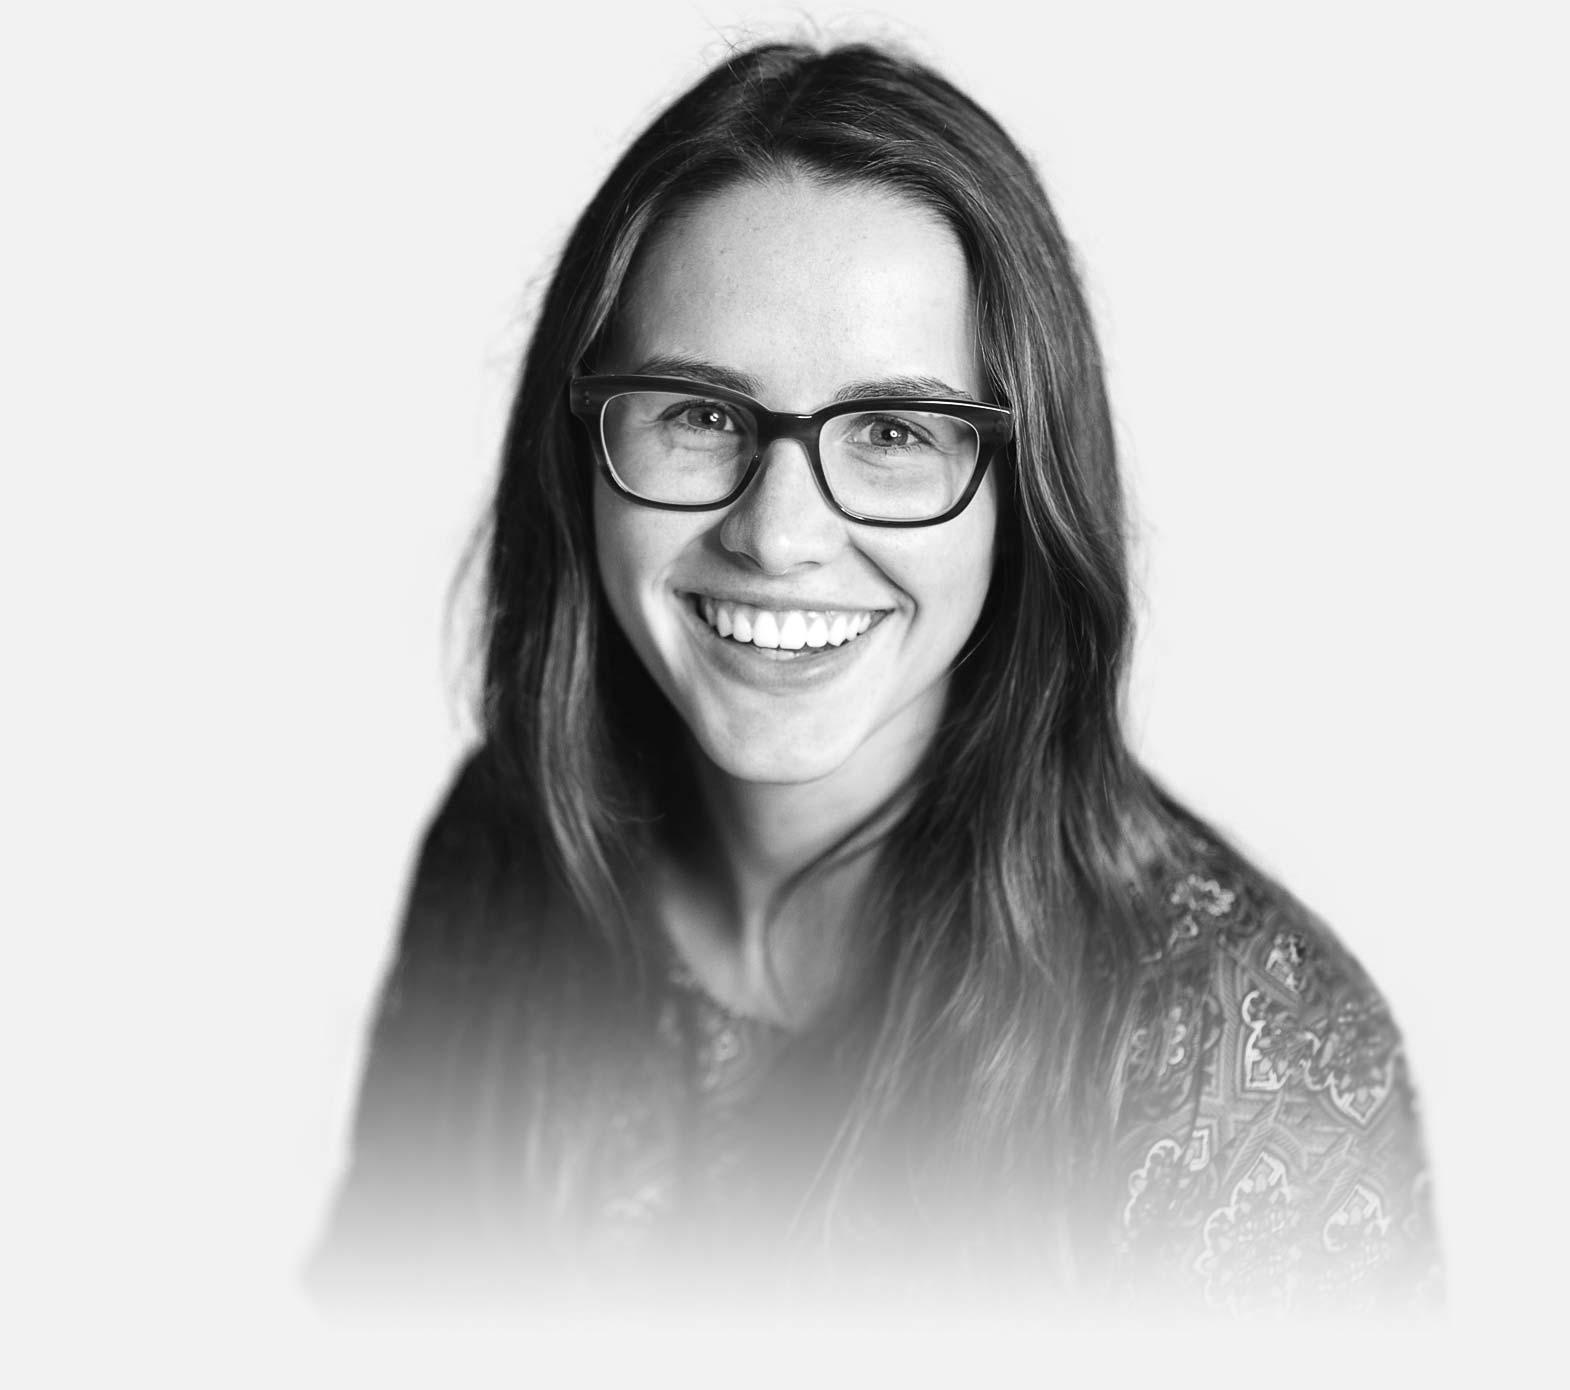 Portrait of Meghan Yabsley